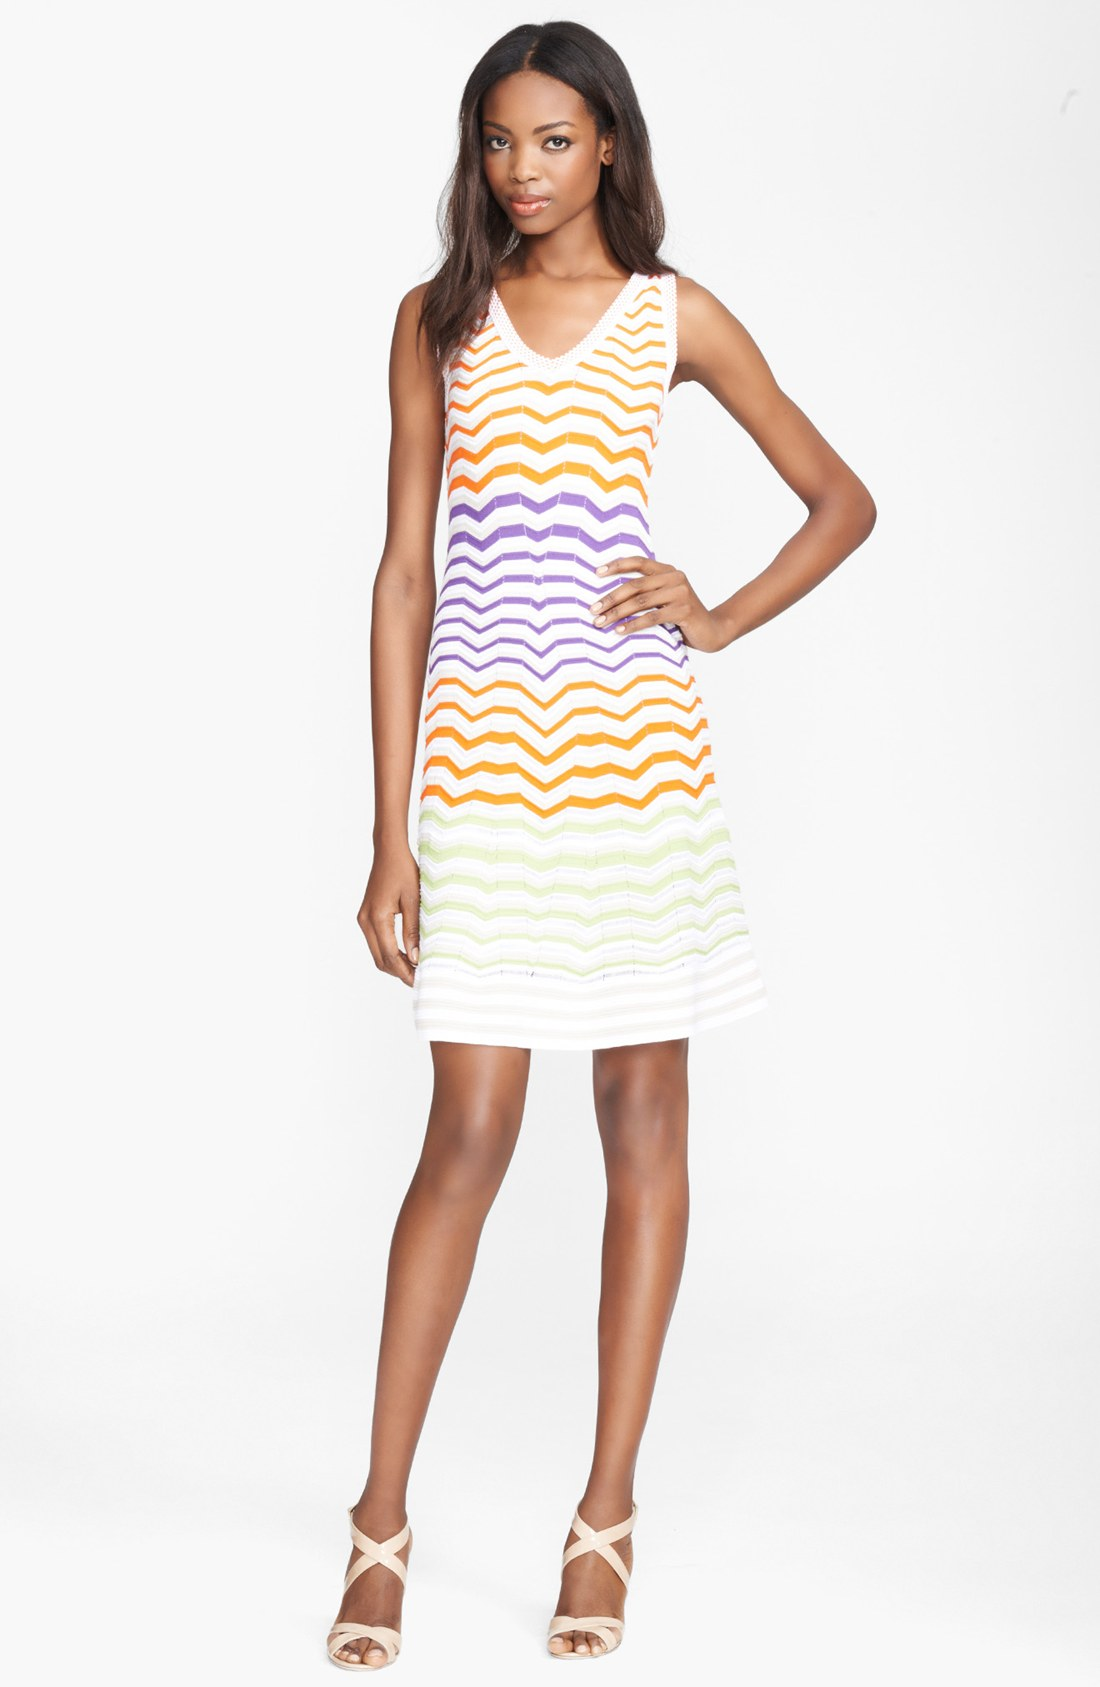 Fancy dress designers m missoni white colorblock zigzag dress product 1 14825629 587666299